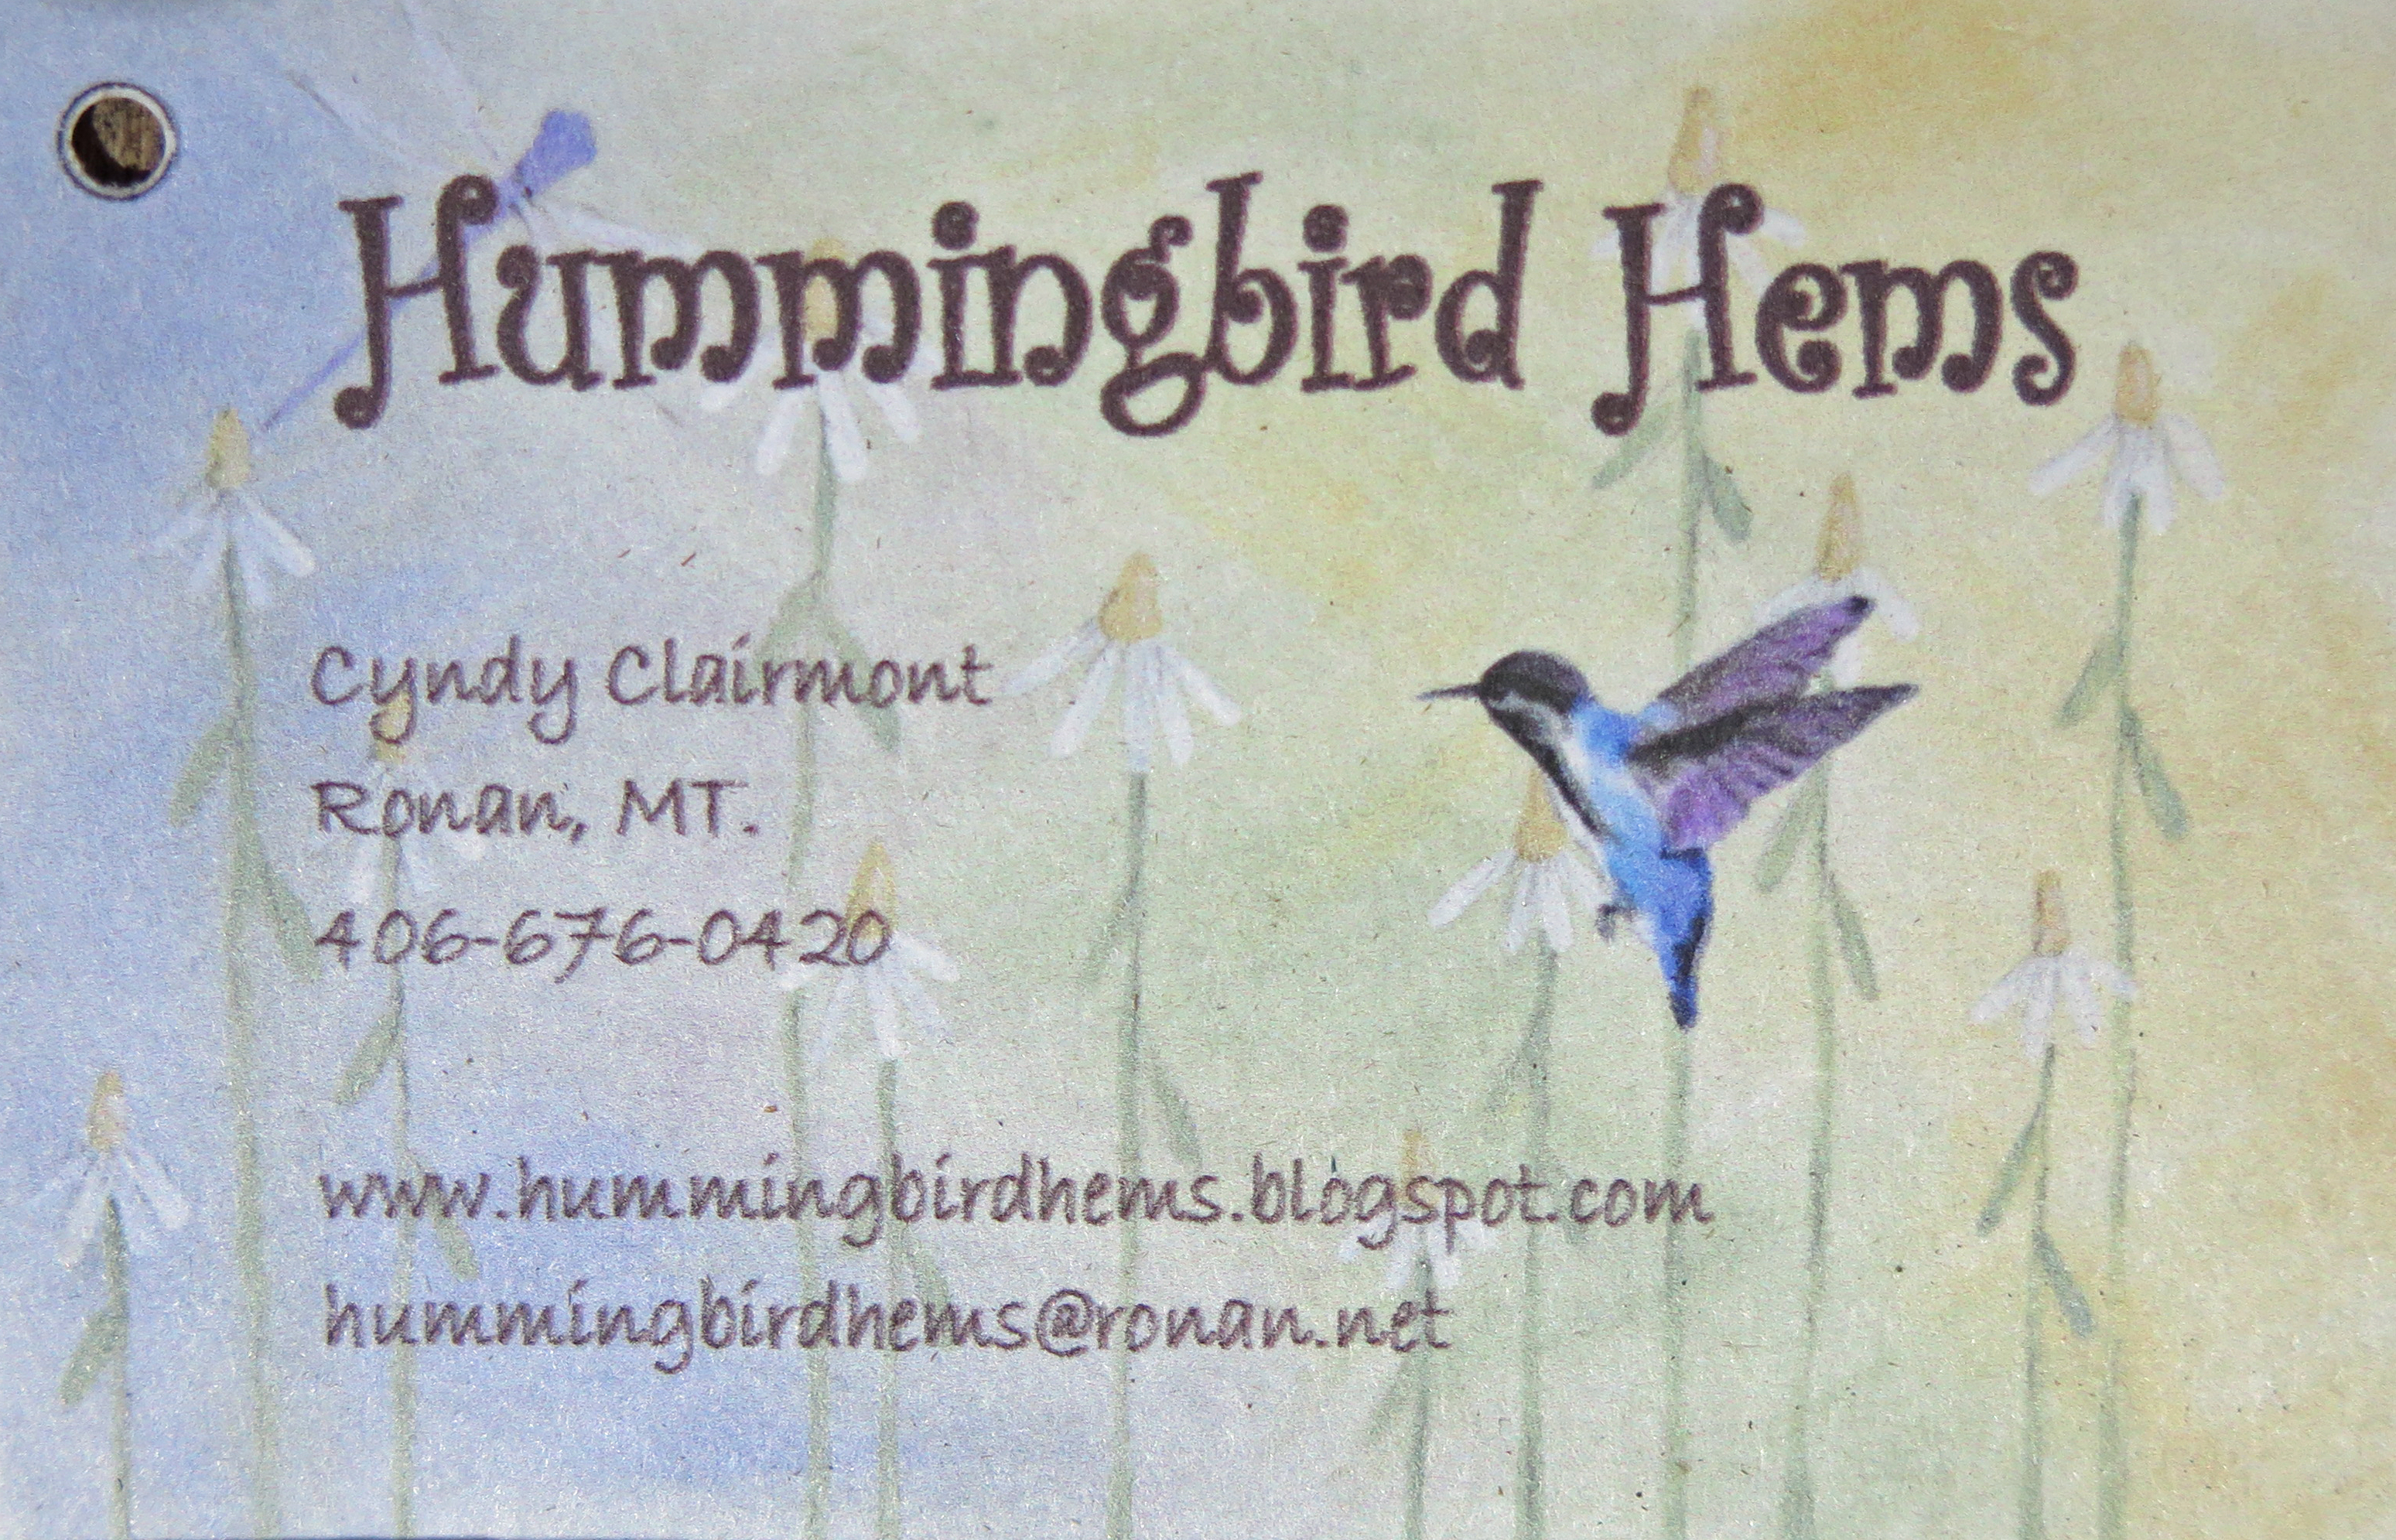 Hummingbird Hems